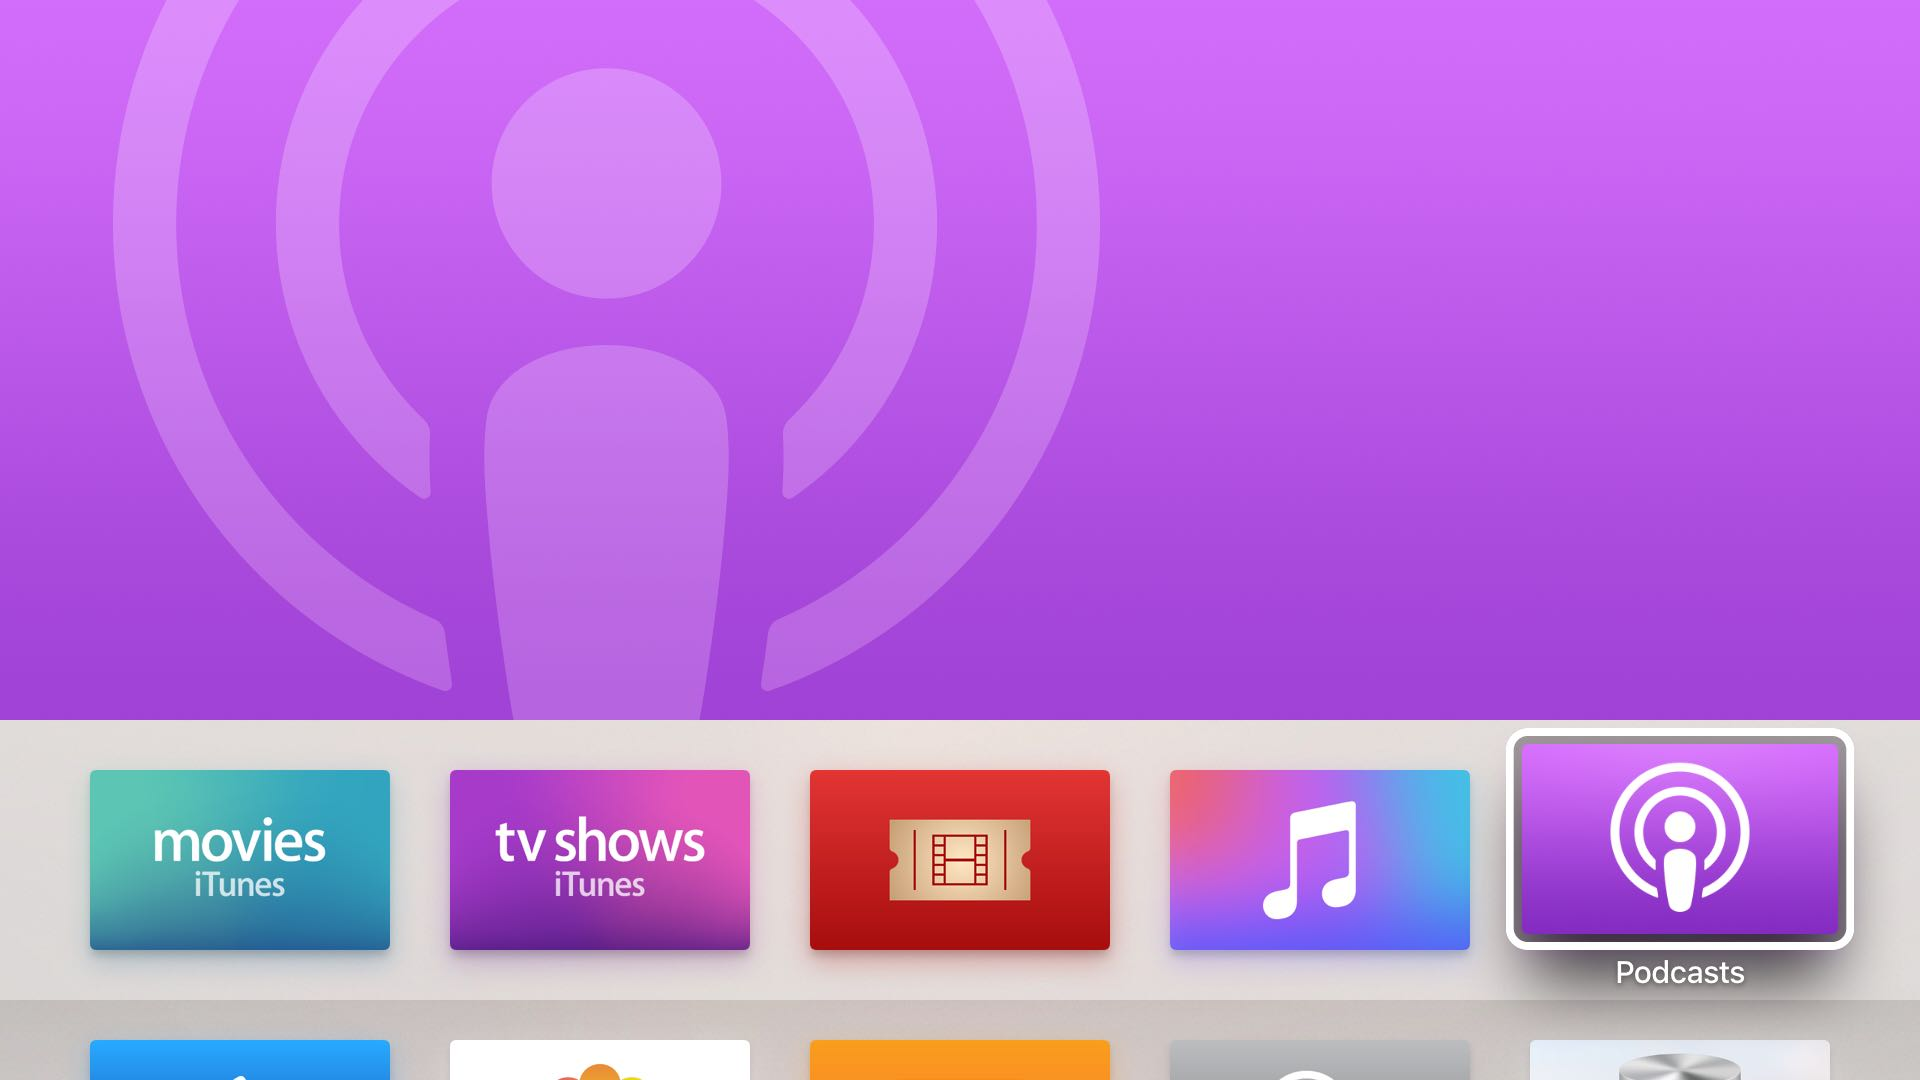 apple tv applications for mac